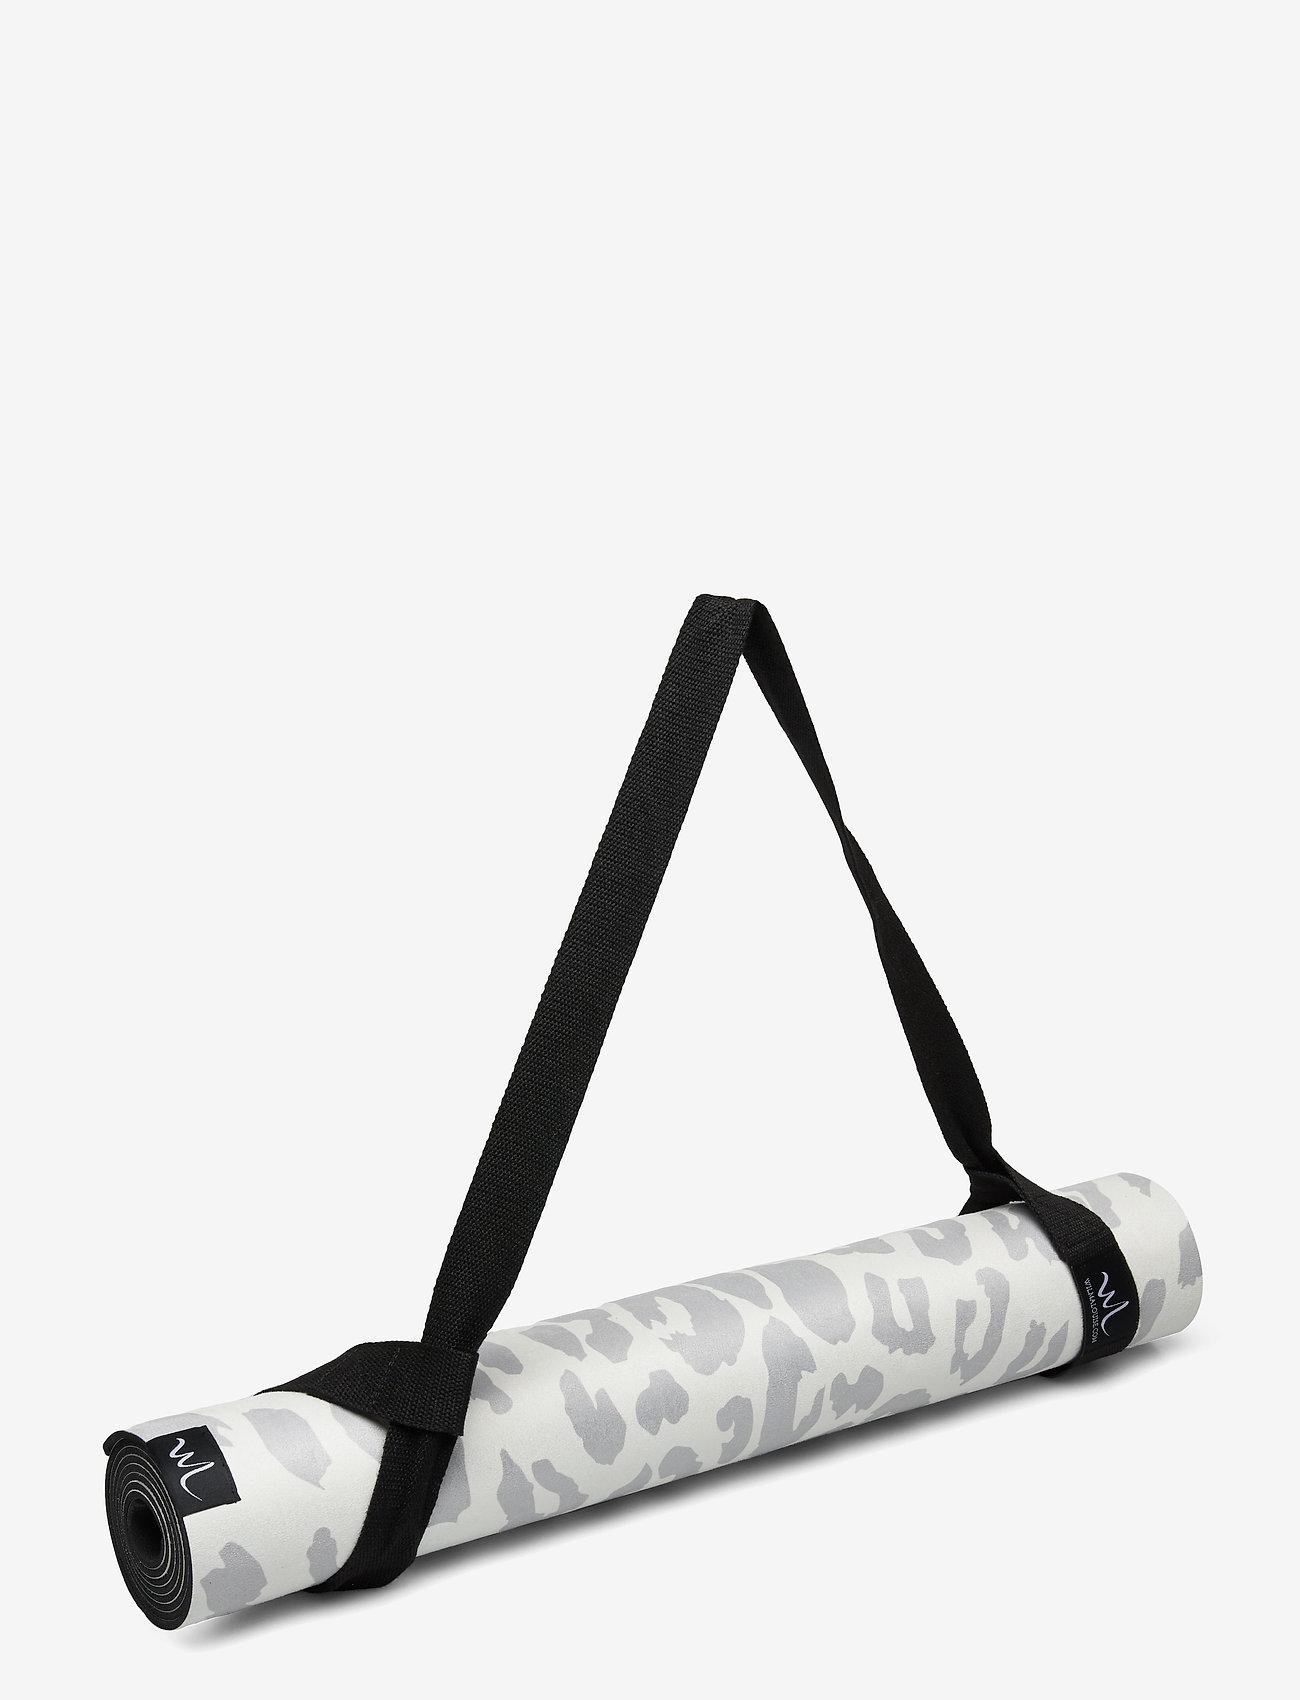 WILMA & LOUISE - Yoga mat Leopard - yogamatten & uitrusting - grey - 0